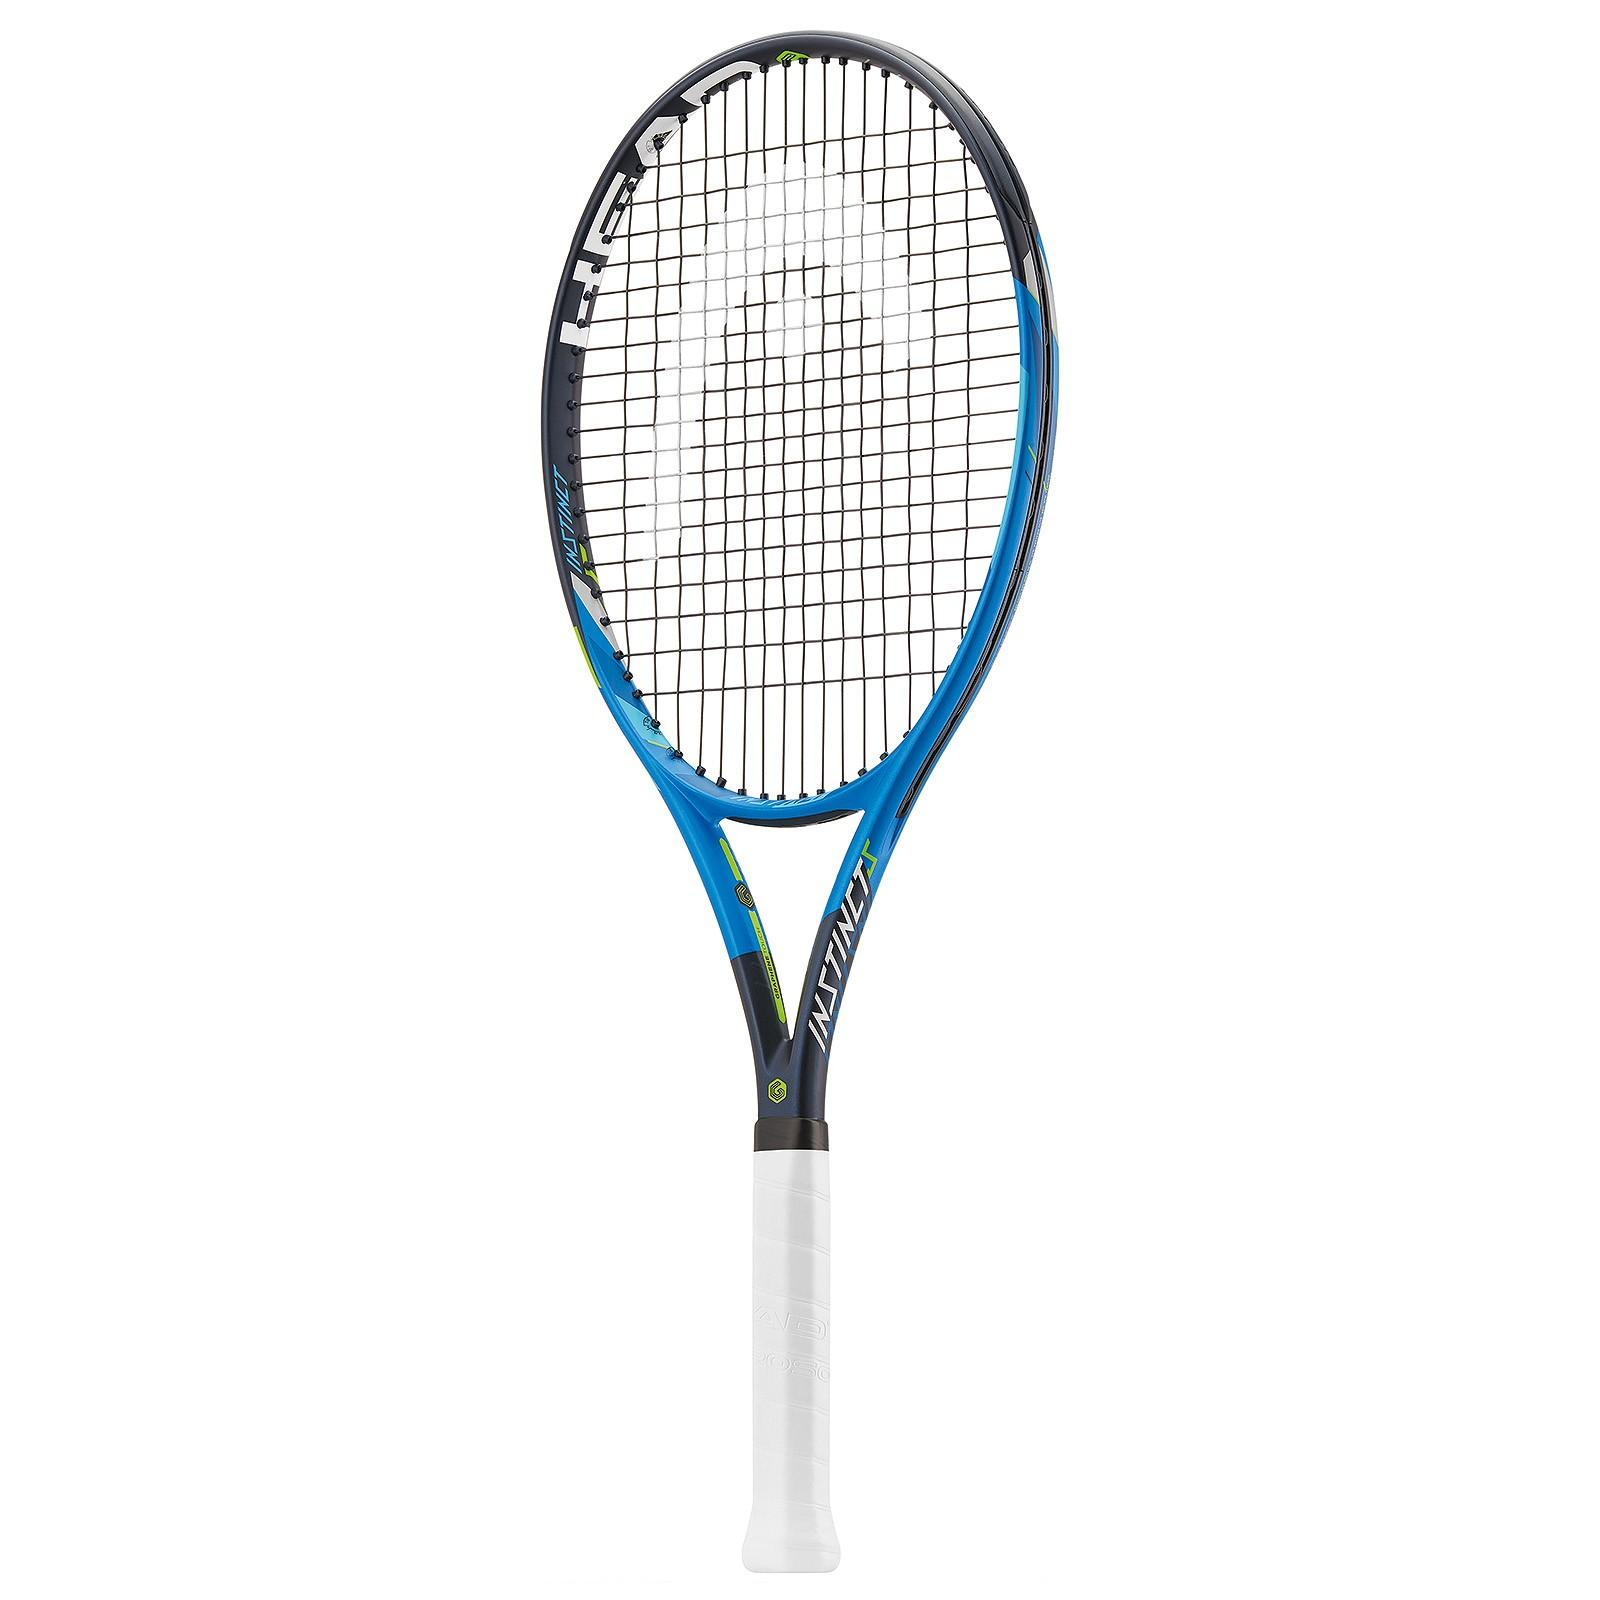 Rakieta tenisowa Head Graphene Touch Instinct S